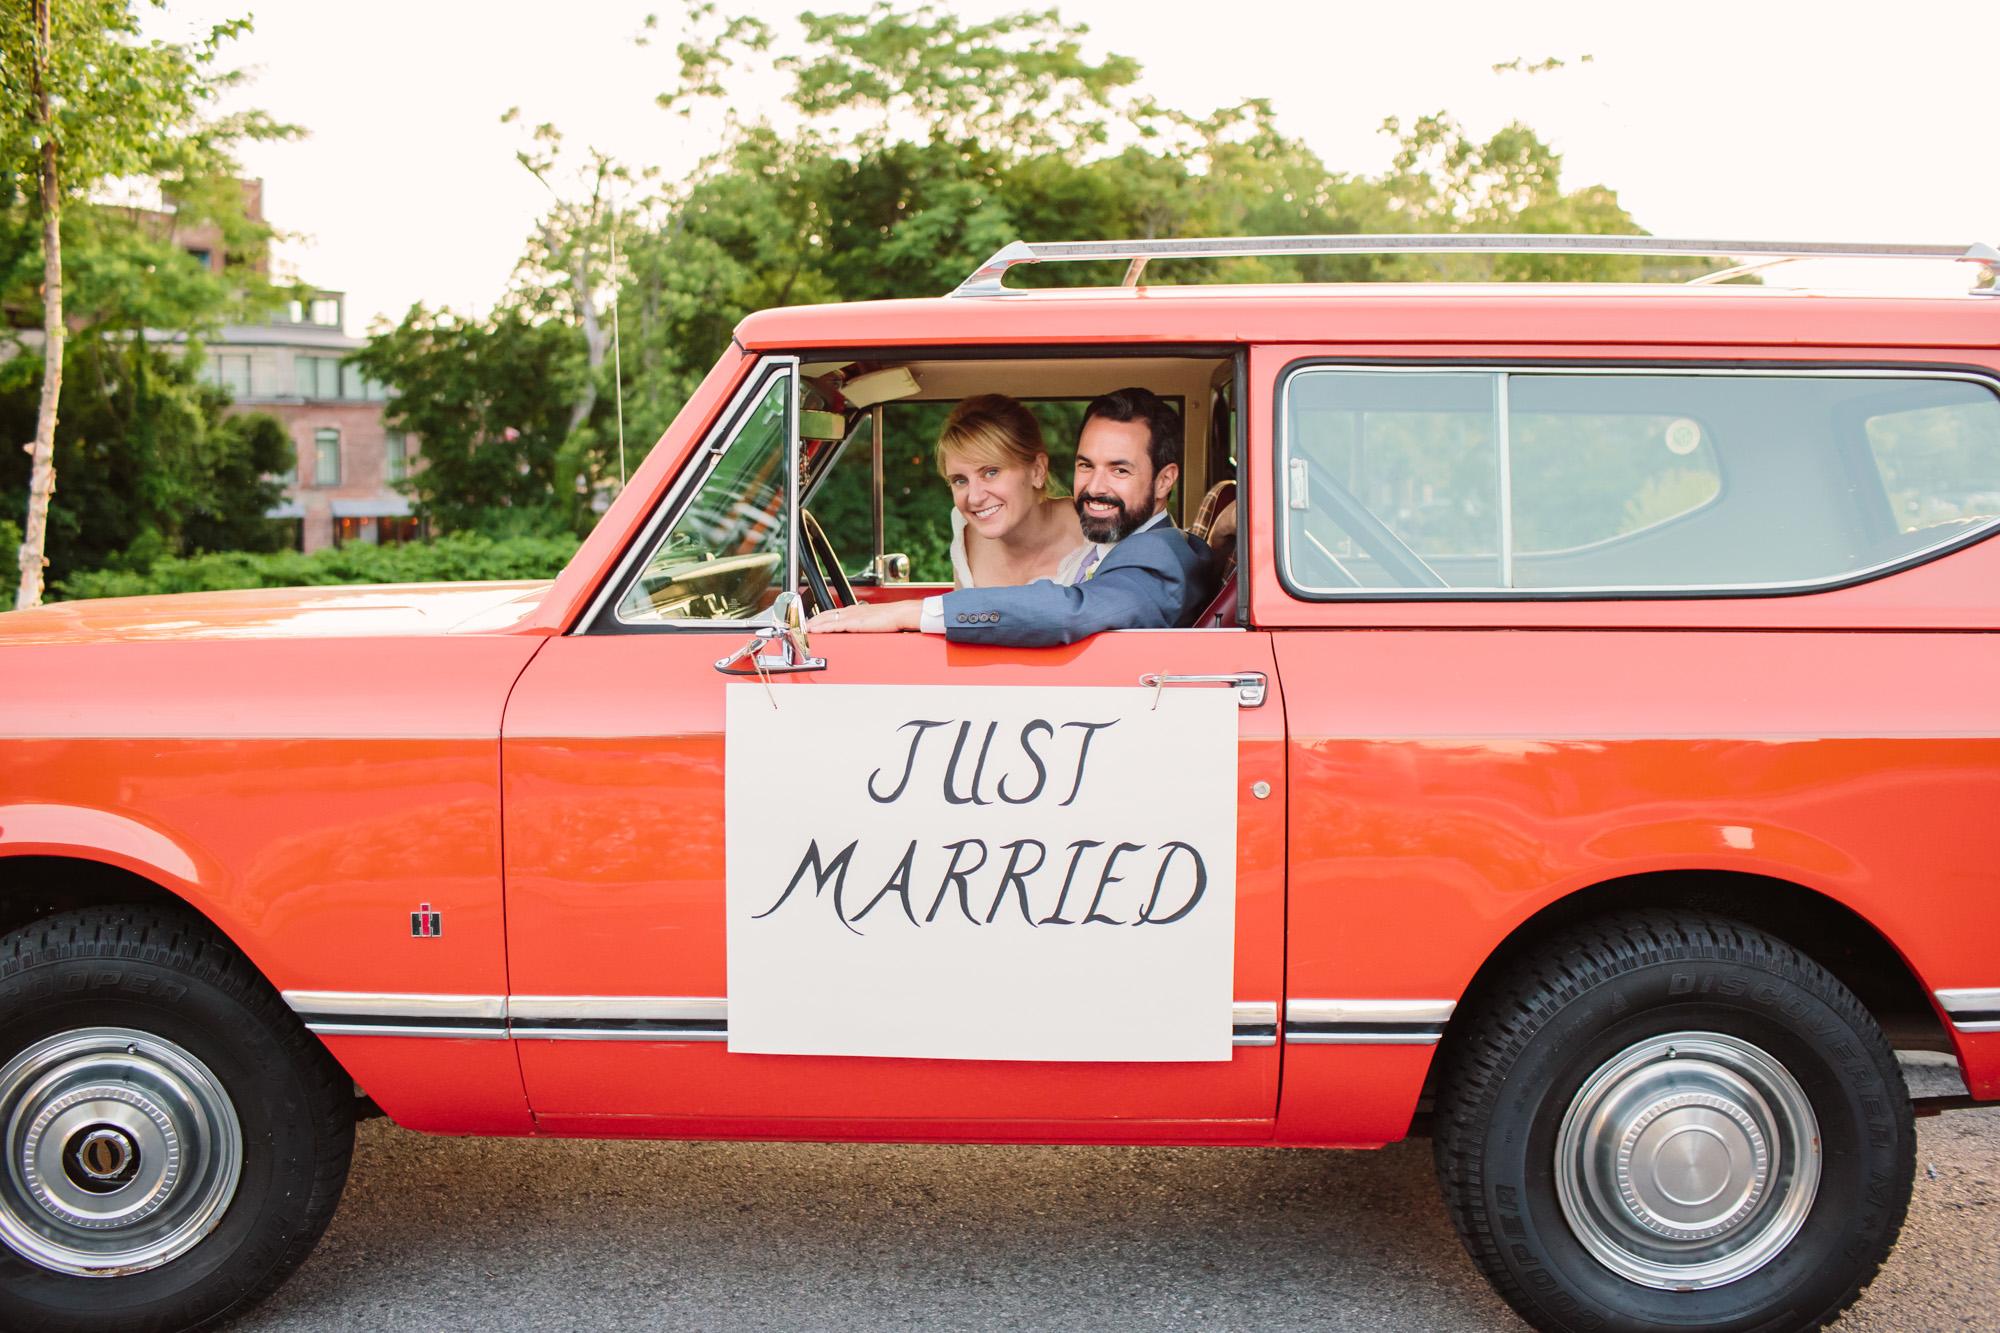 66_Rowan_Brian_The_Roundhouse_Wedding_Beacon_NY_Tanya_Salazar_Photography_361.jpg